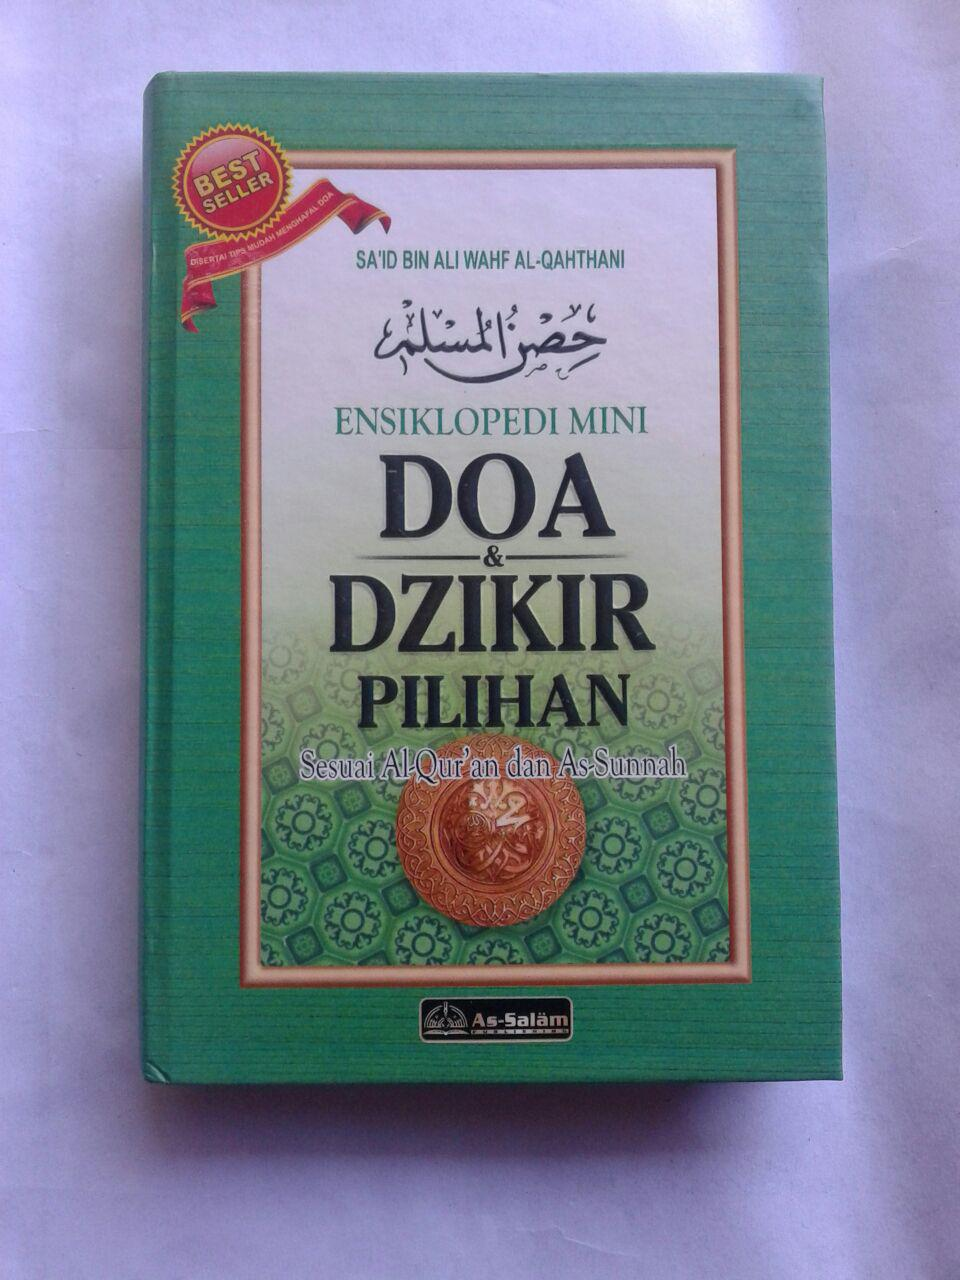 Buku Saku Hisnul Muslim Ensiklopedi Mini Doa & Dzikir Pilihan Cover